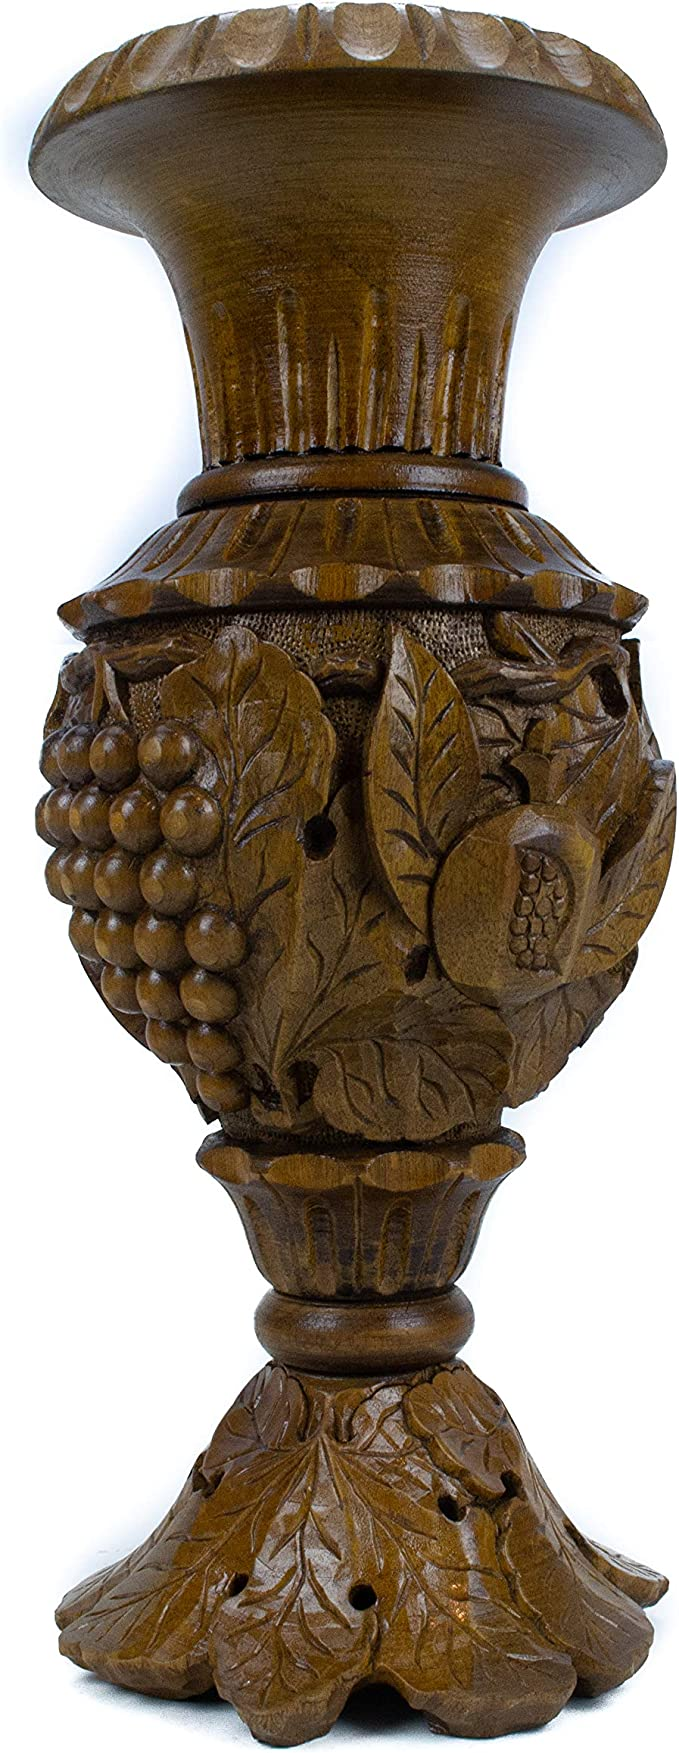 Armenian Bowl Big handmade Walnut Wood Carved Bowl hand carved bowl wooden Candy dish Wooden vase fruit bowl wooden carved vase